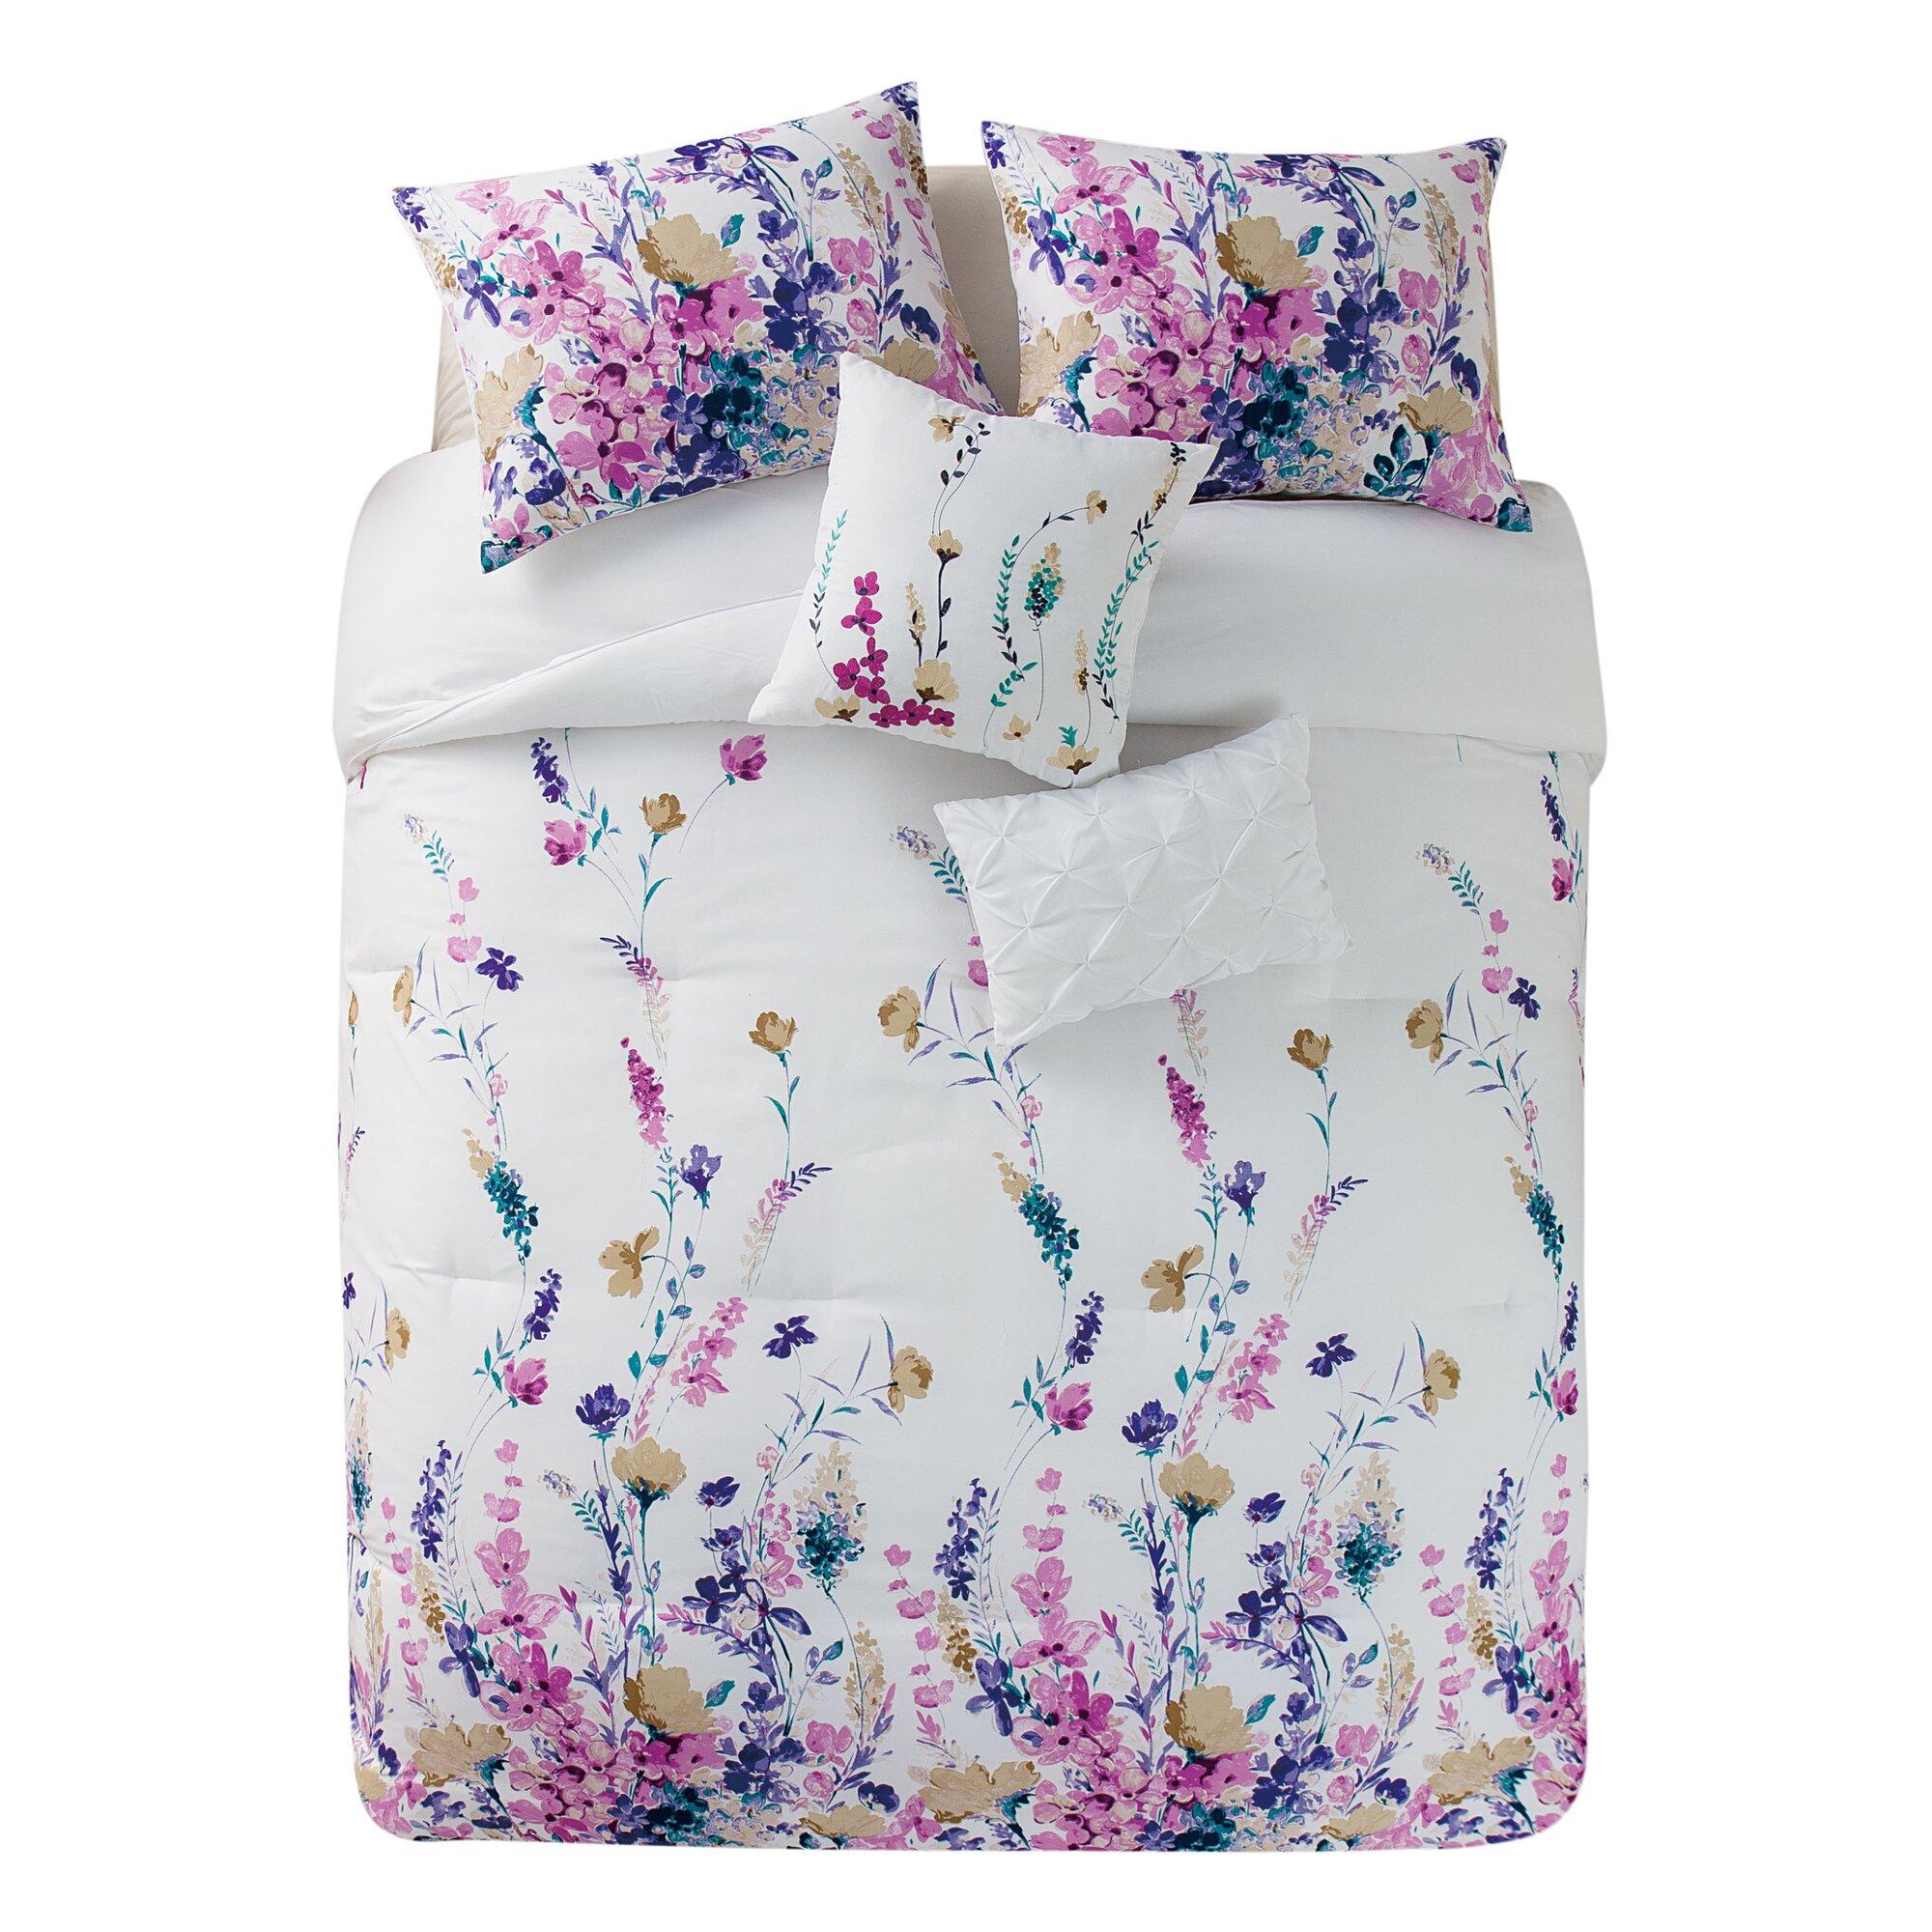 House of hampton pressly comforter set reviews wayfair for House of hampton bedding